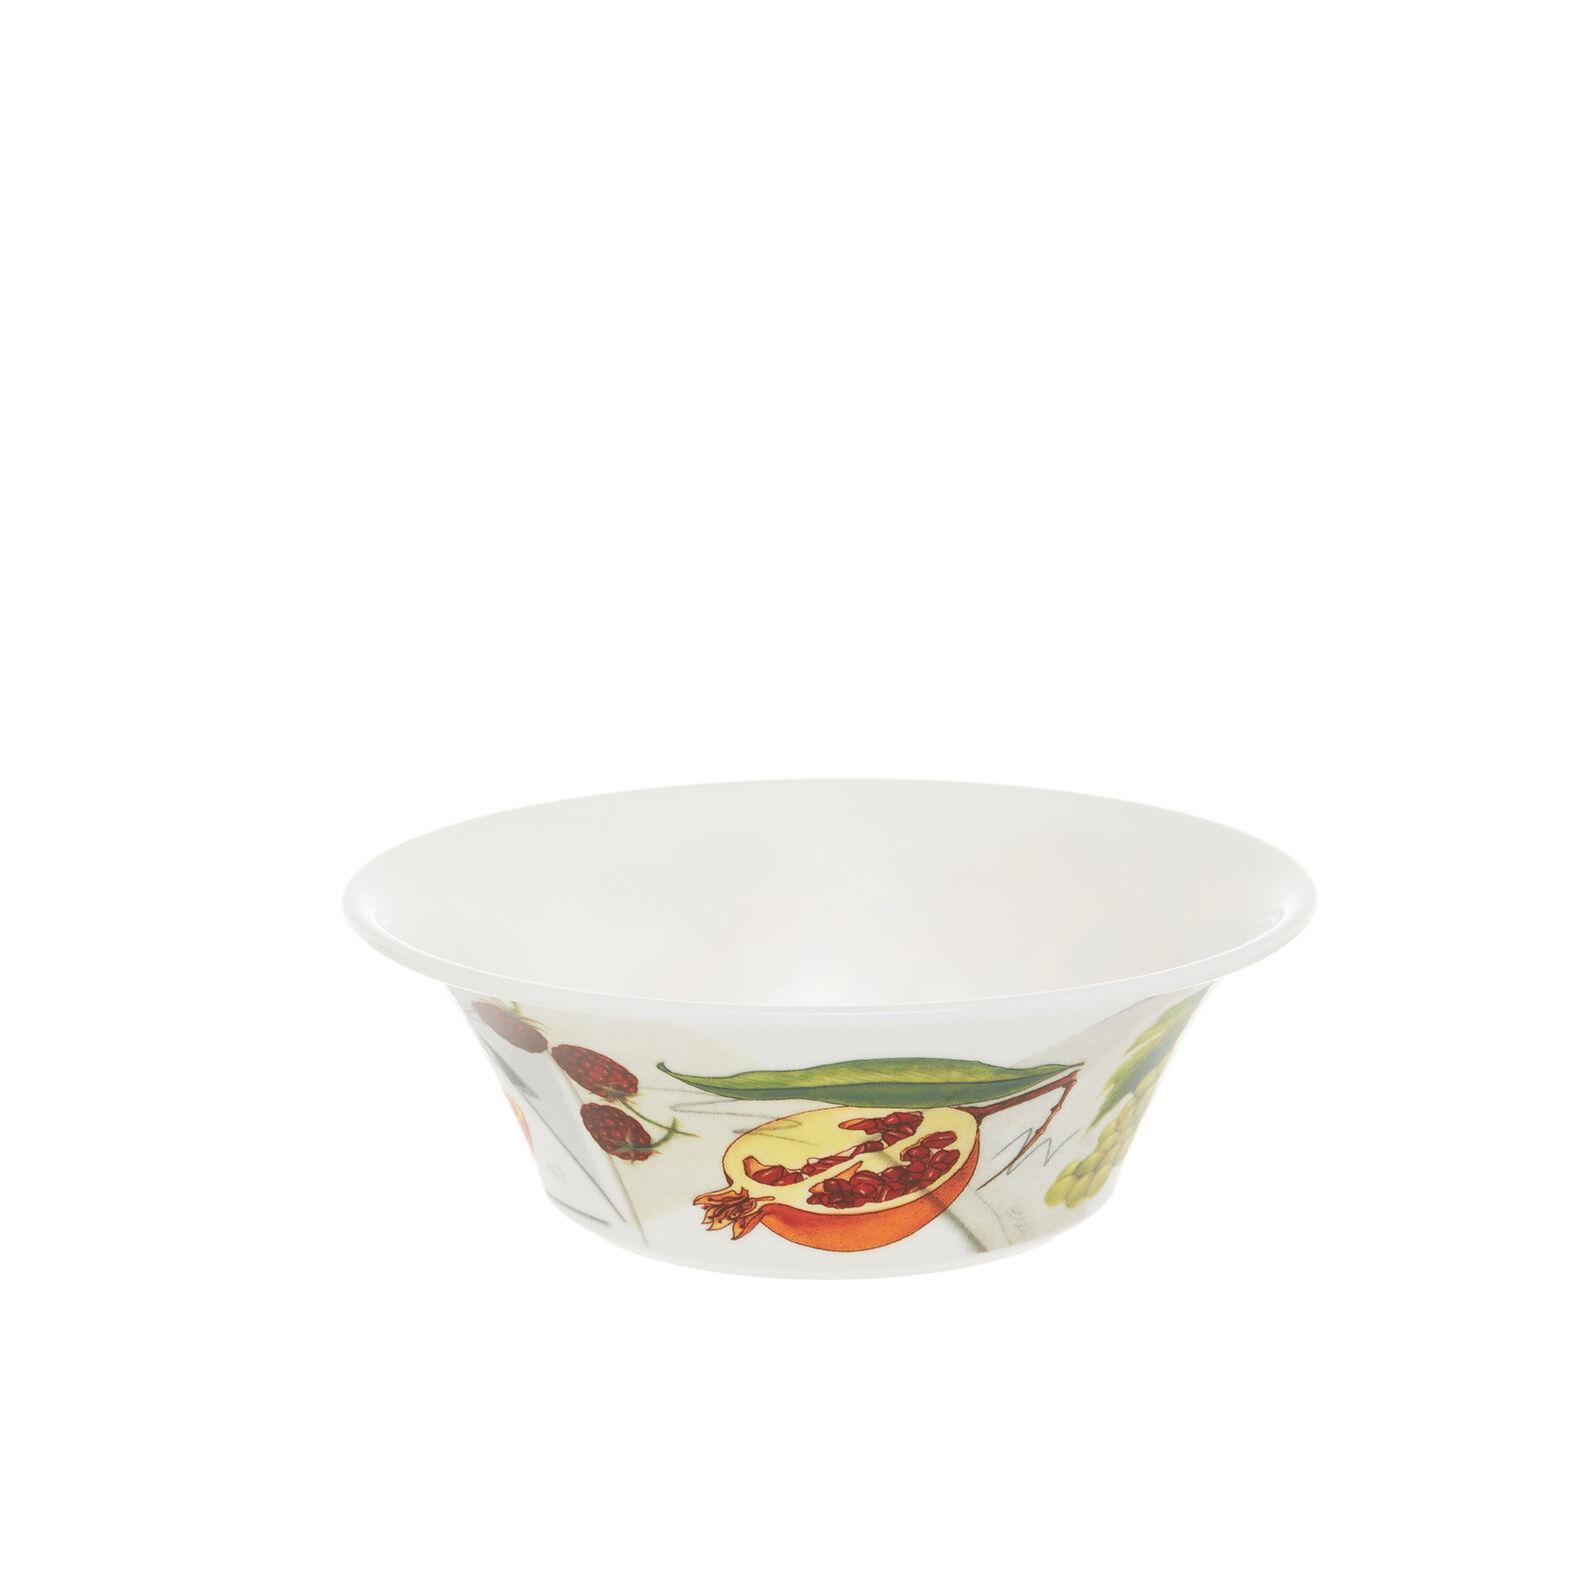 Small fine bone china bowl with vegan La Cucina Italiana decoration